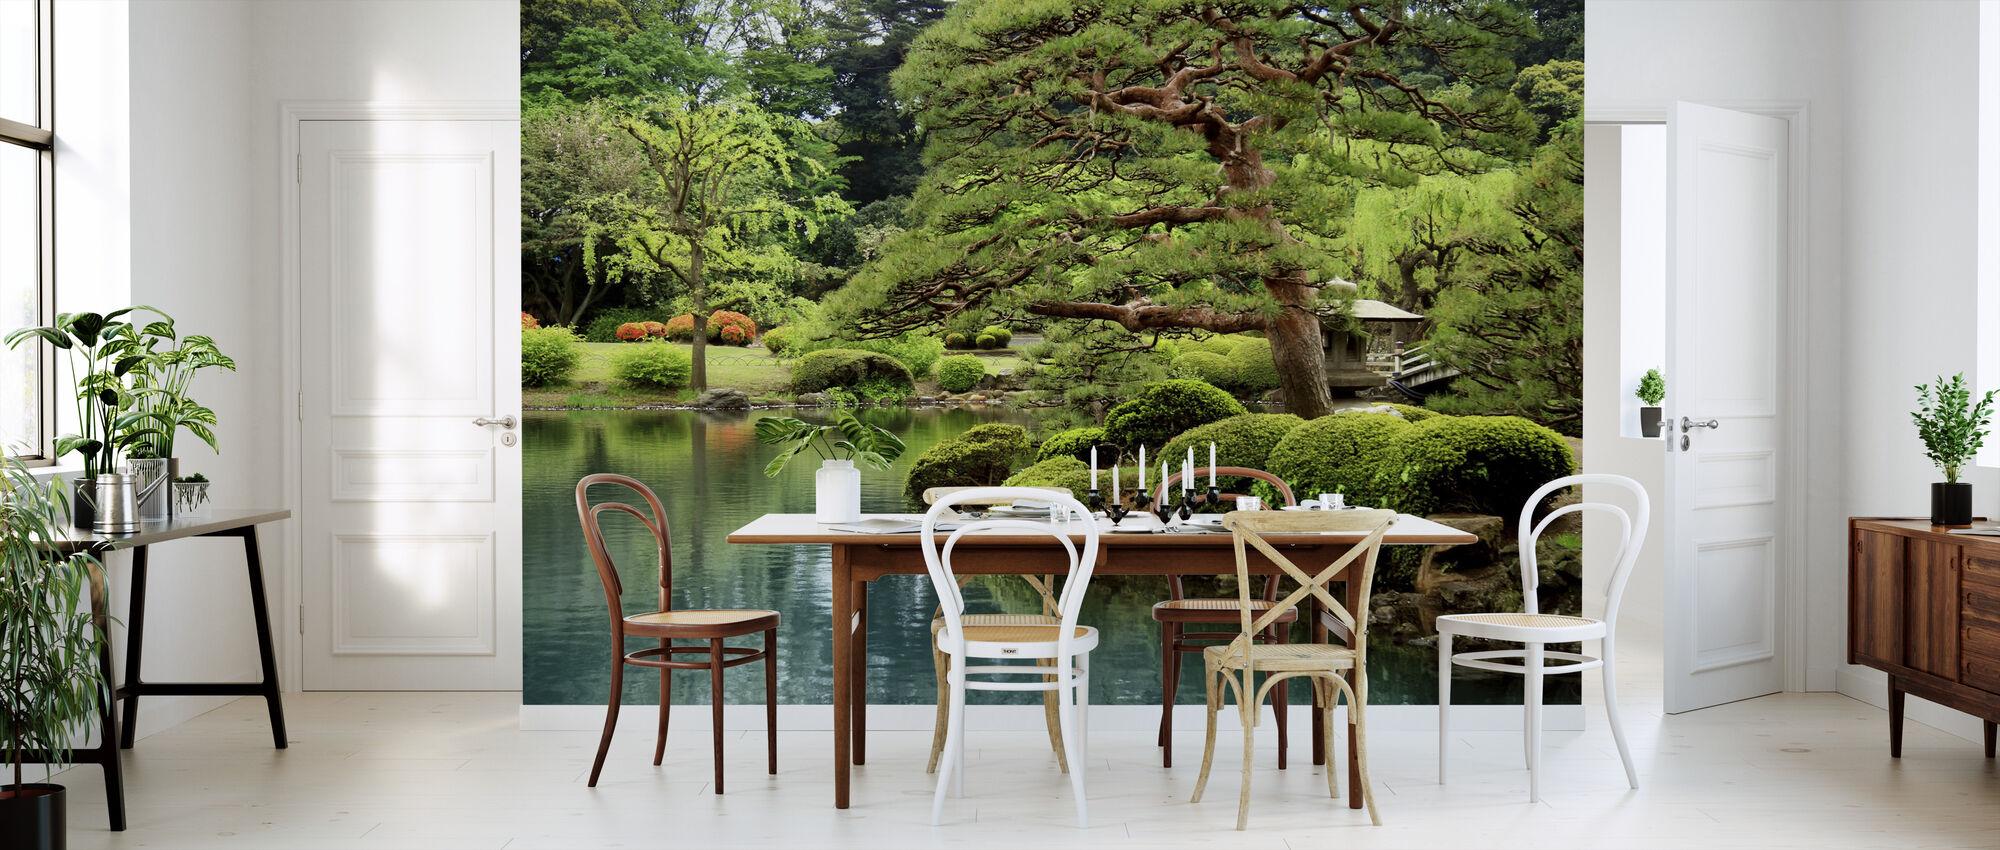 Kalm Zen Lake en Bonsai bomen in Tokio Garden - Behang - Keuken